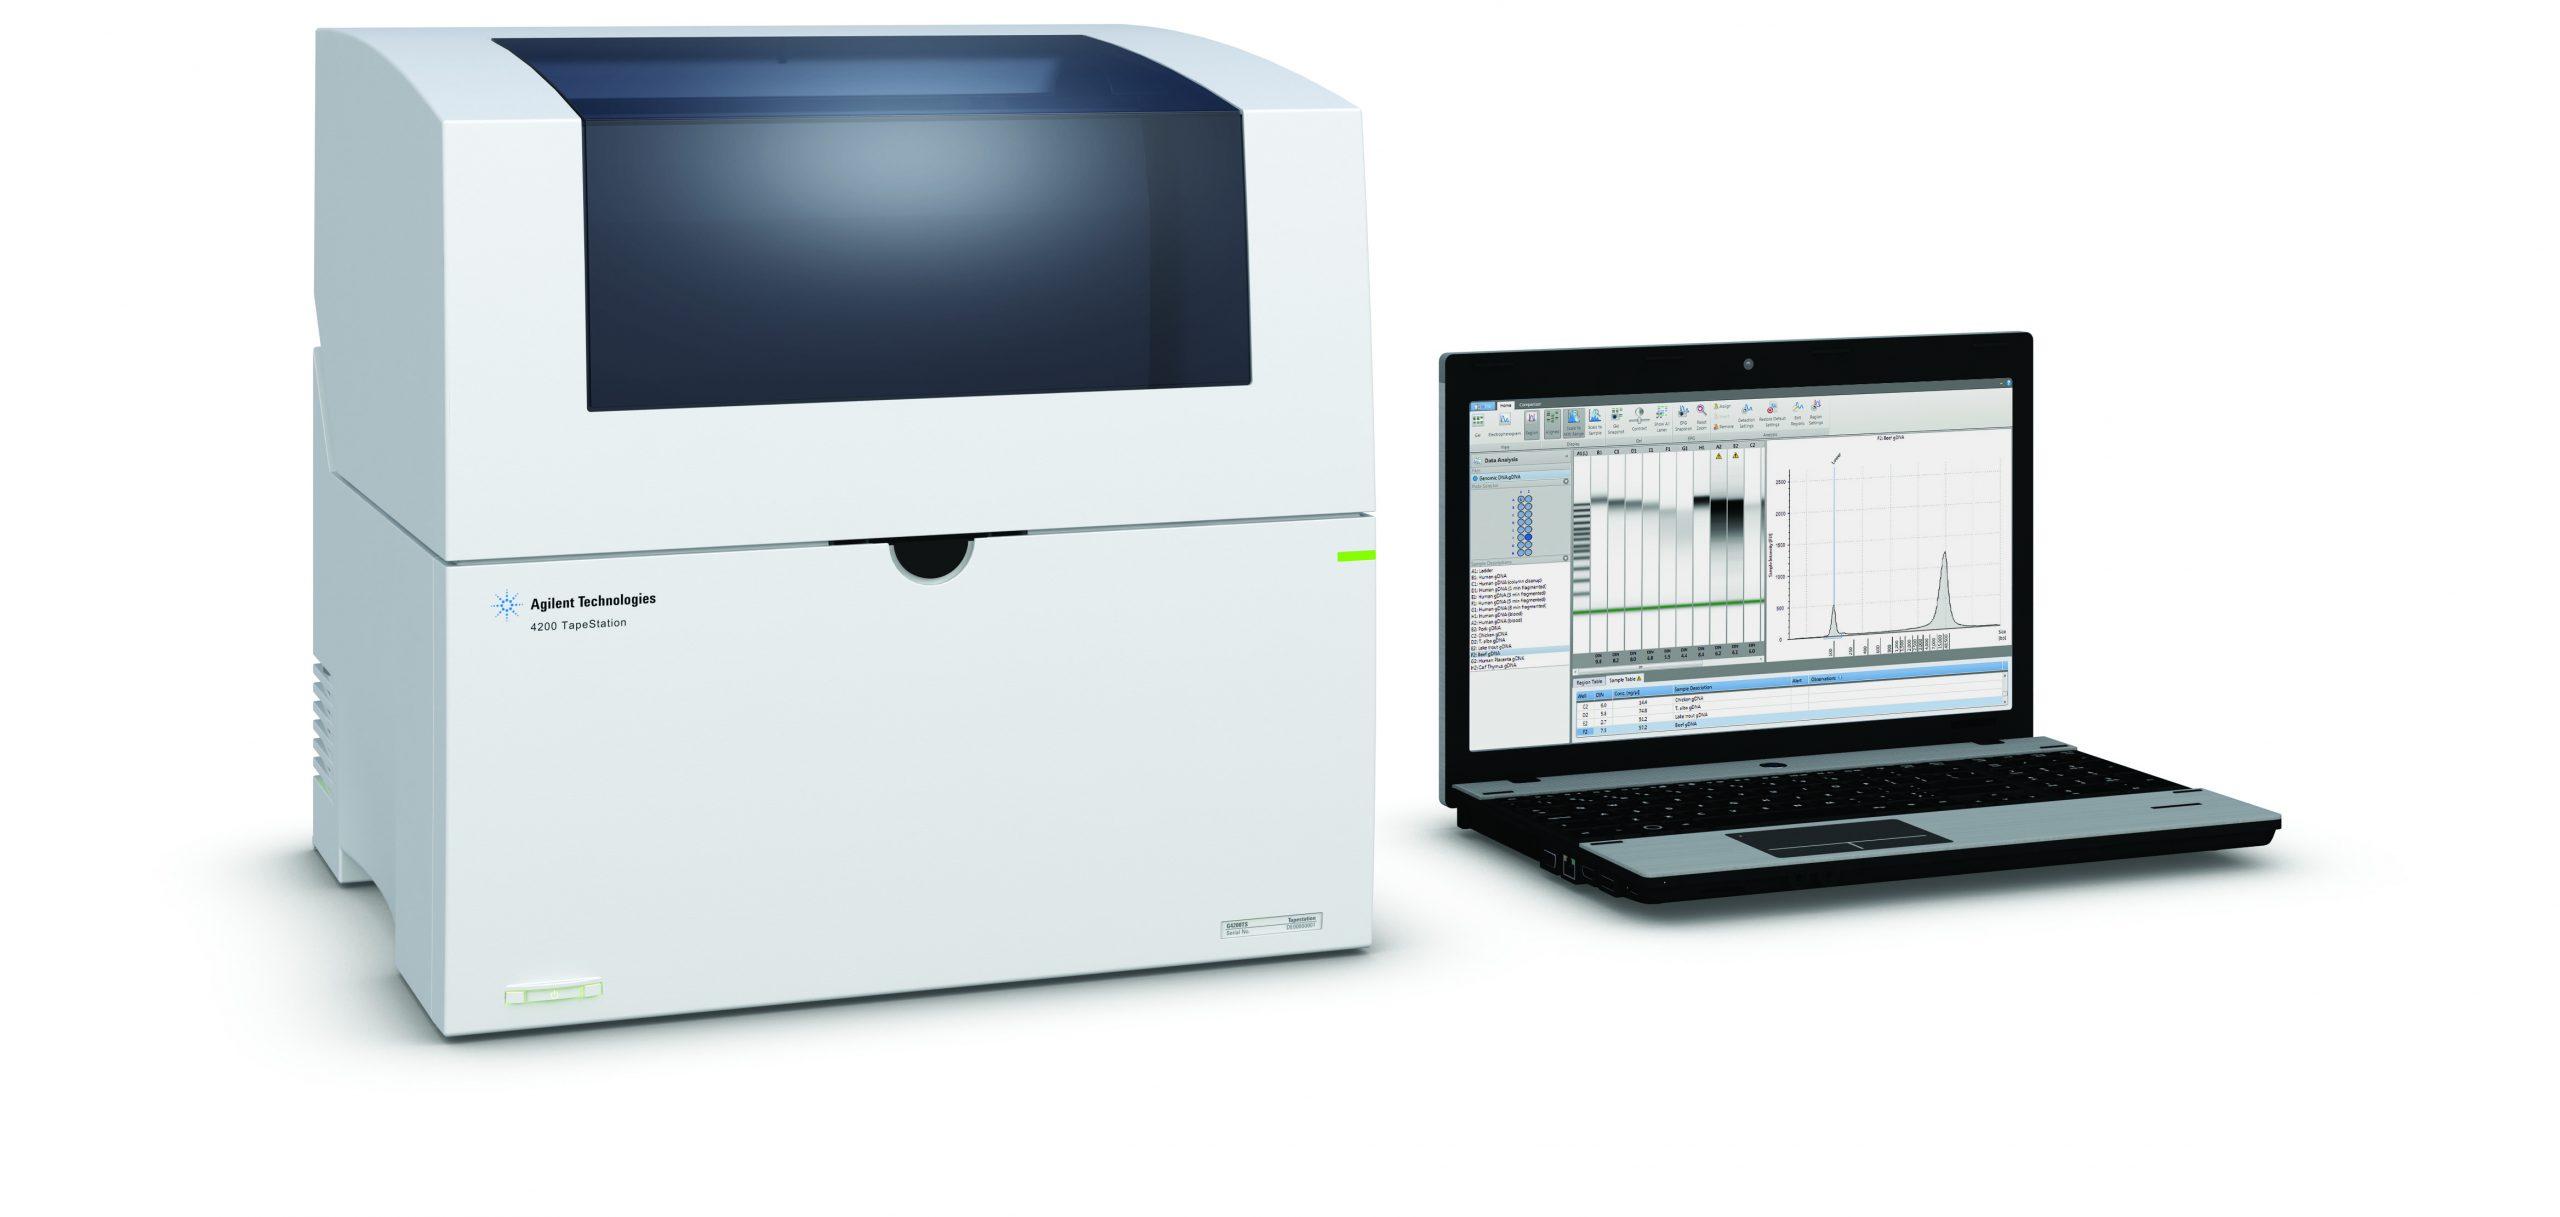 4200 TapeStationSystem (Agilent)